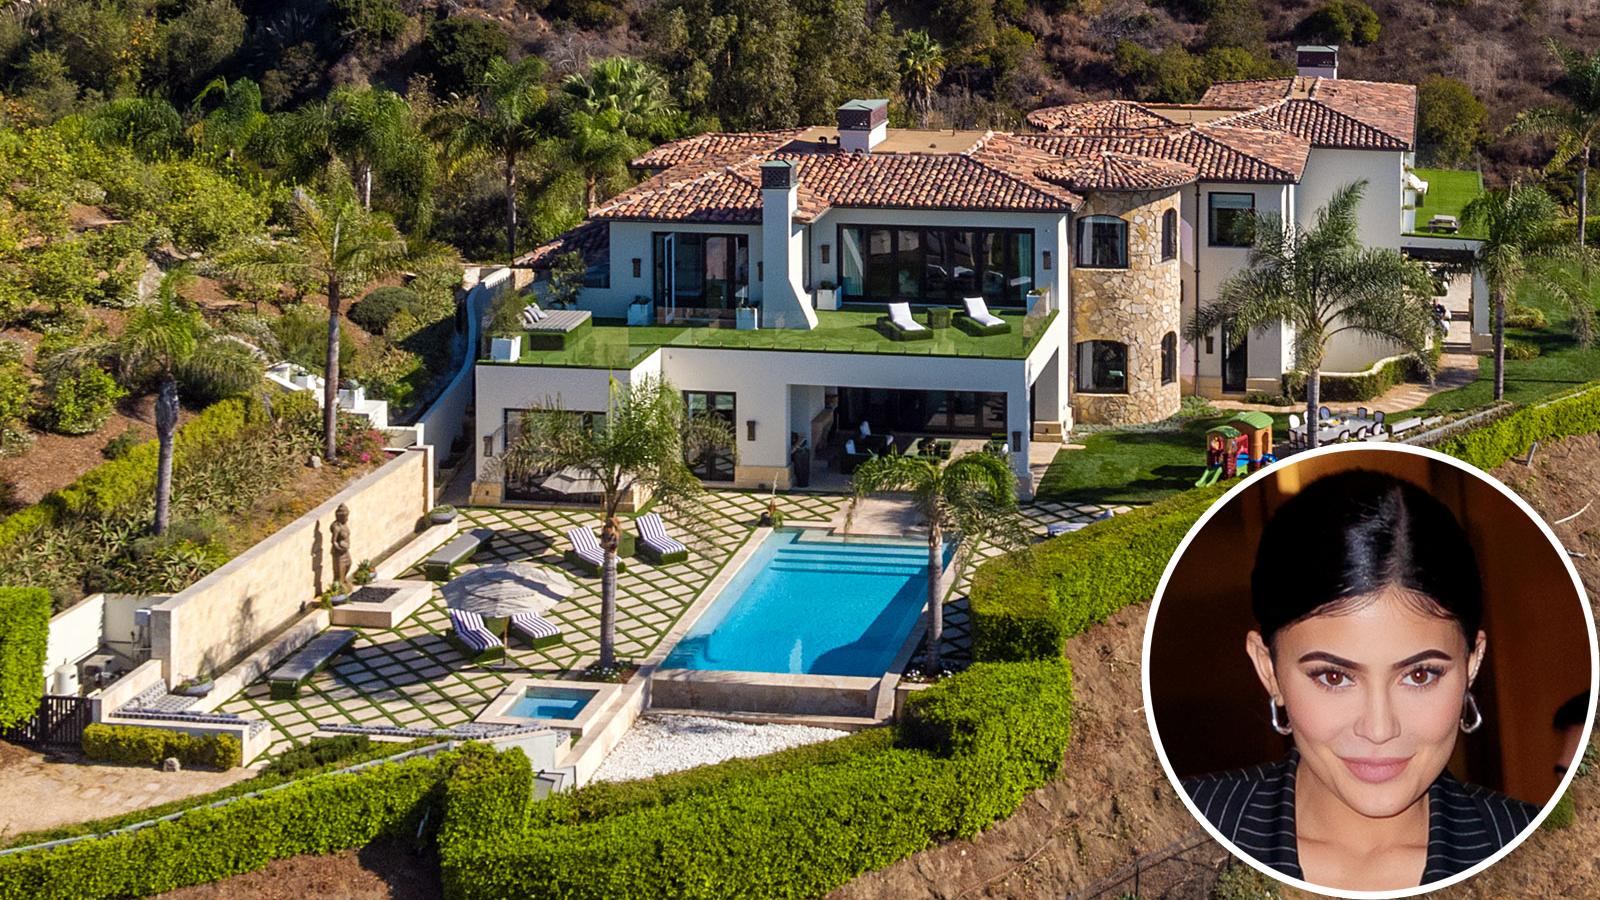 Kylie Jenner's Malibu Mansion: 'KUWTK' Star Pays $450,000 a Month